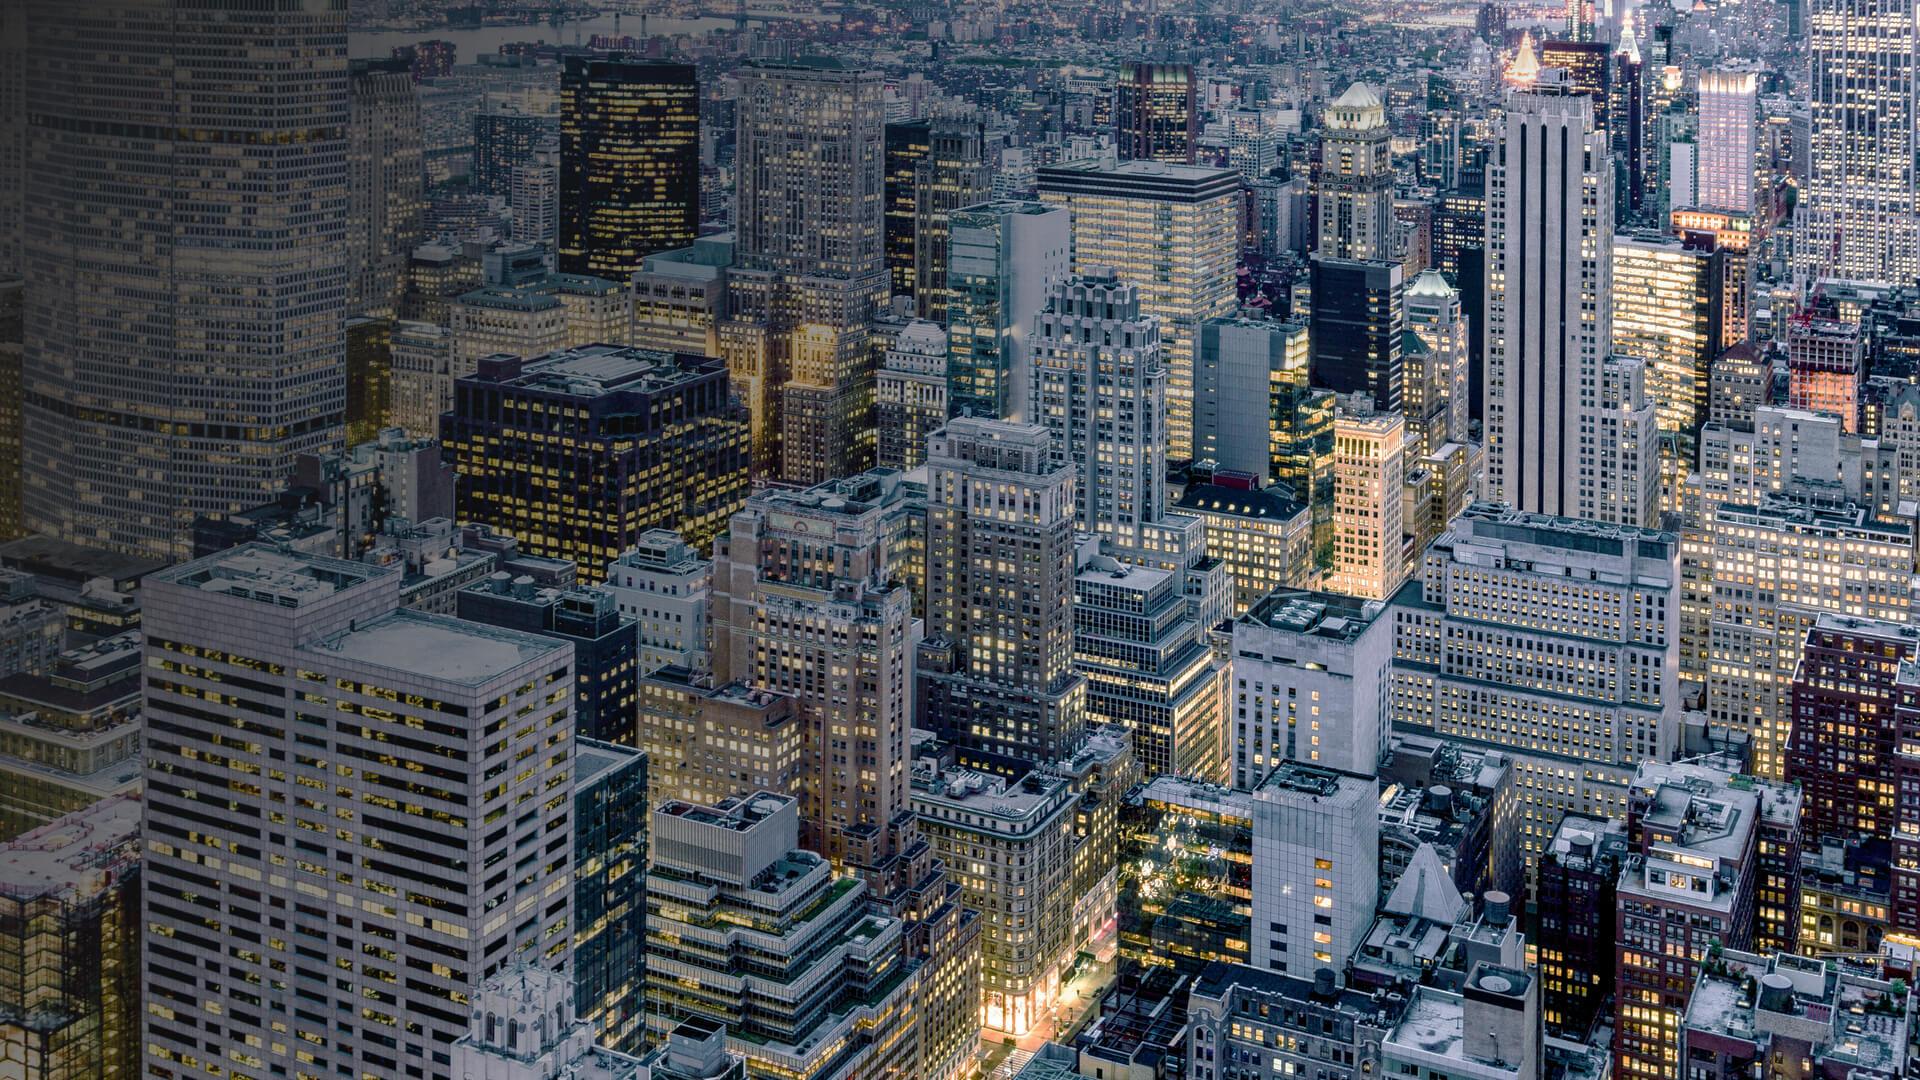 skyline image of New York City